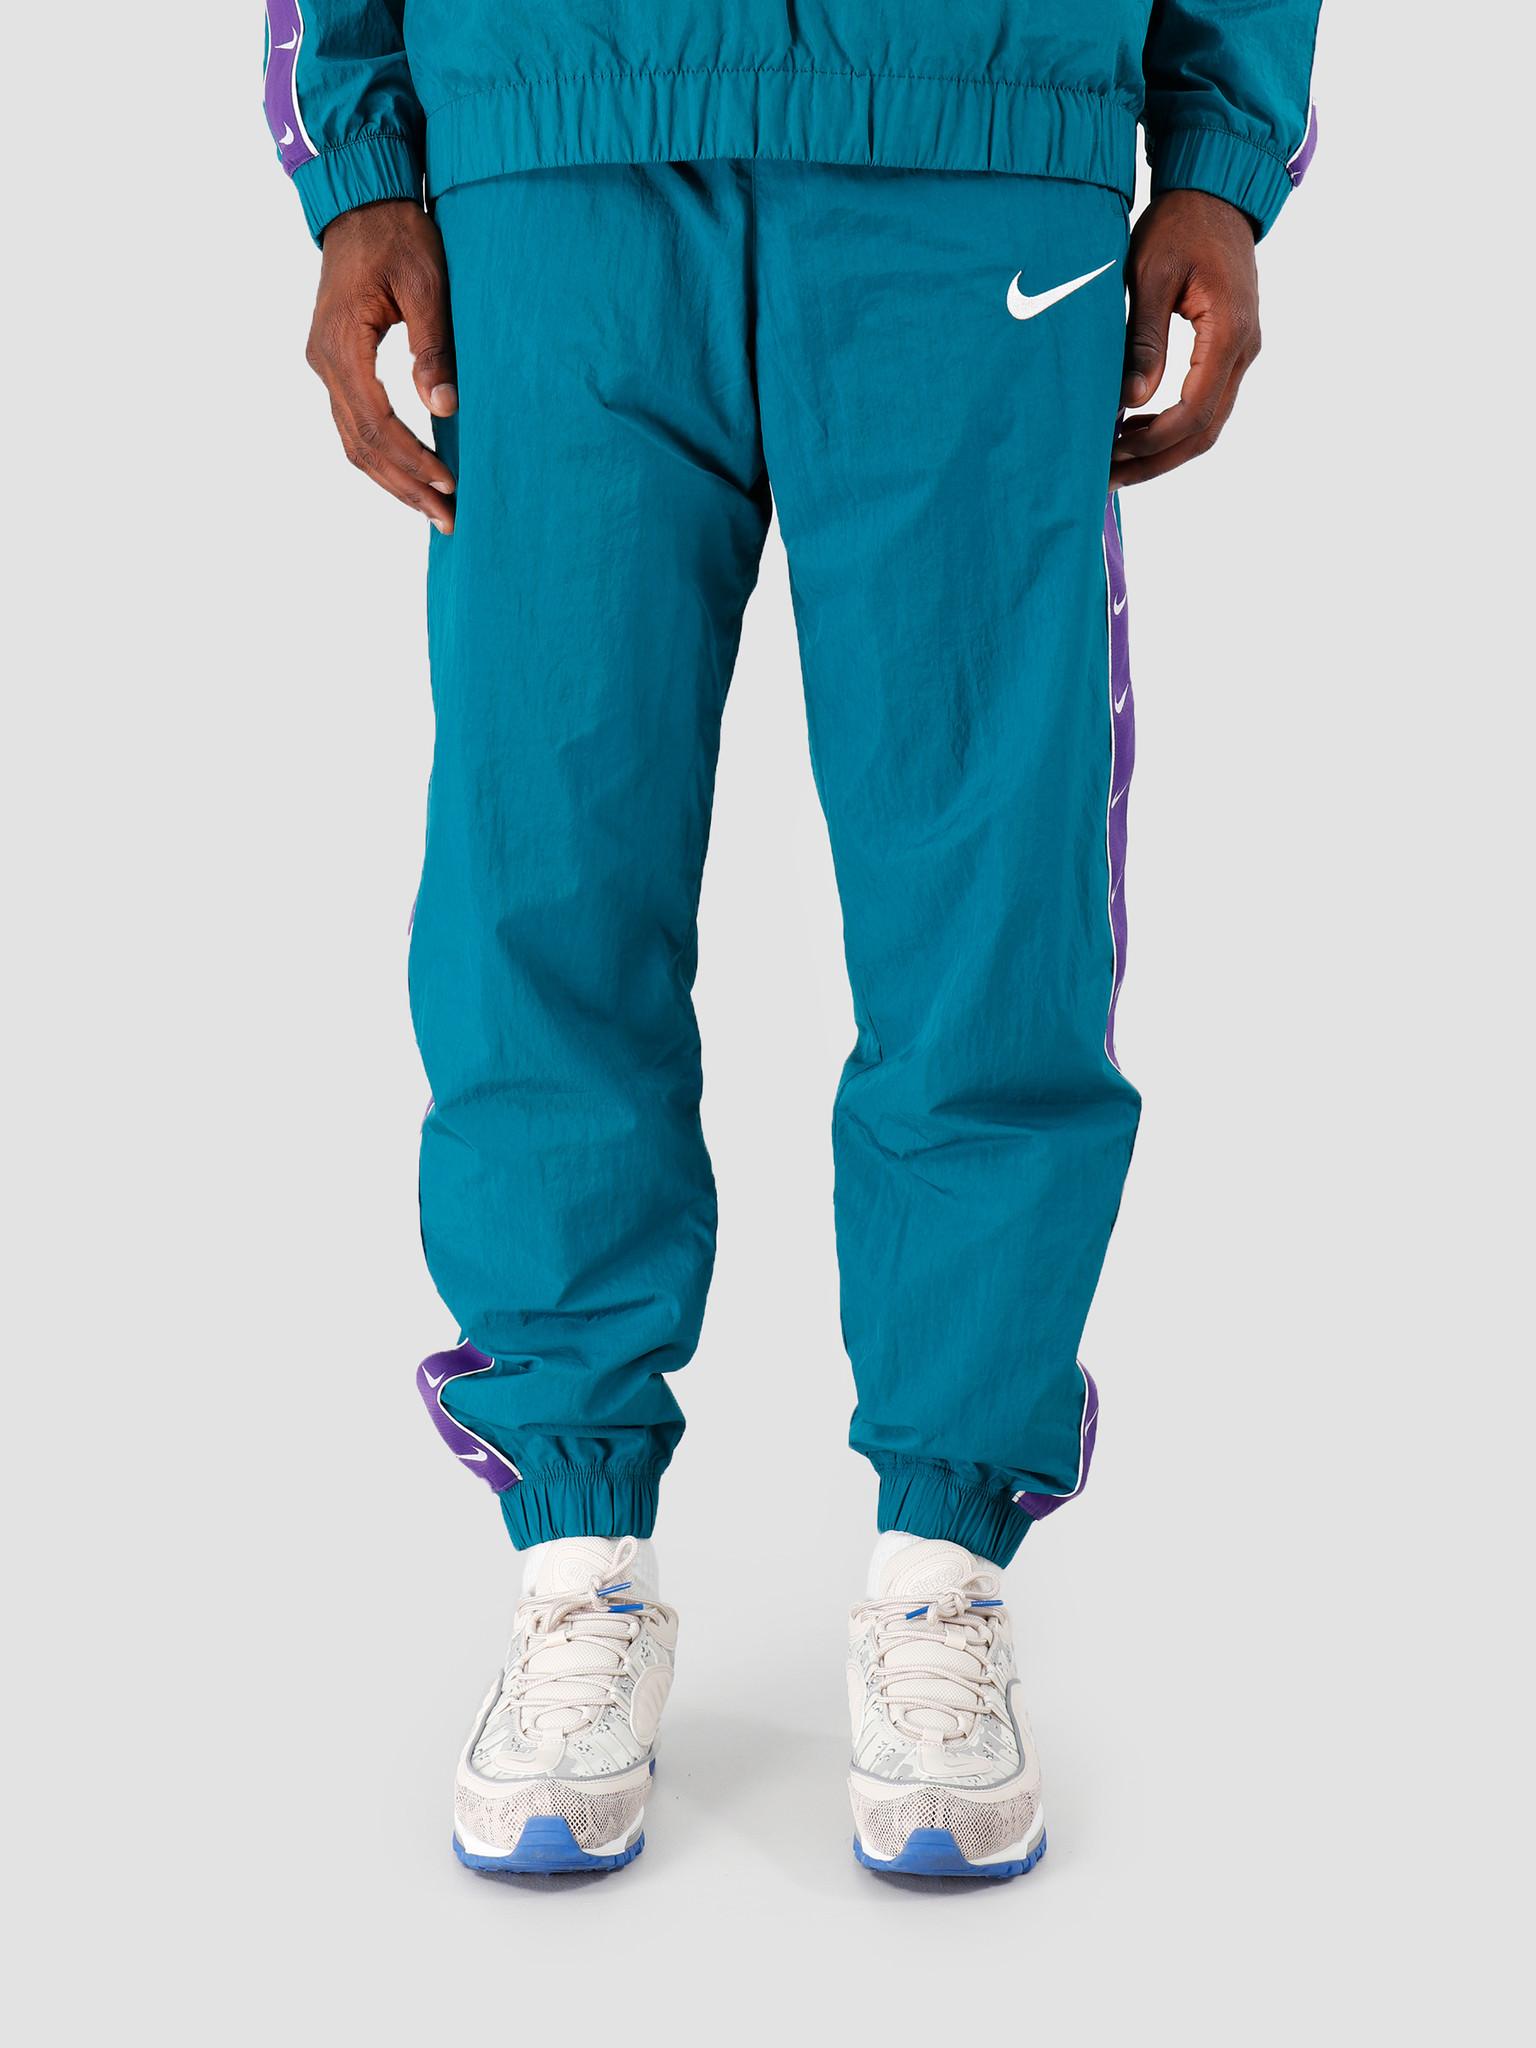 Nike Nike NSW Swoosh Pant Wvn Geode Teal Court Purple White CD0421-381